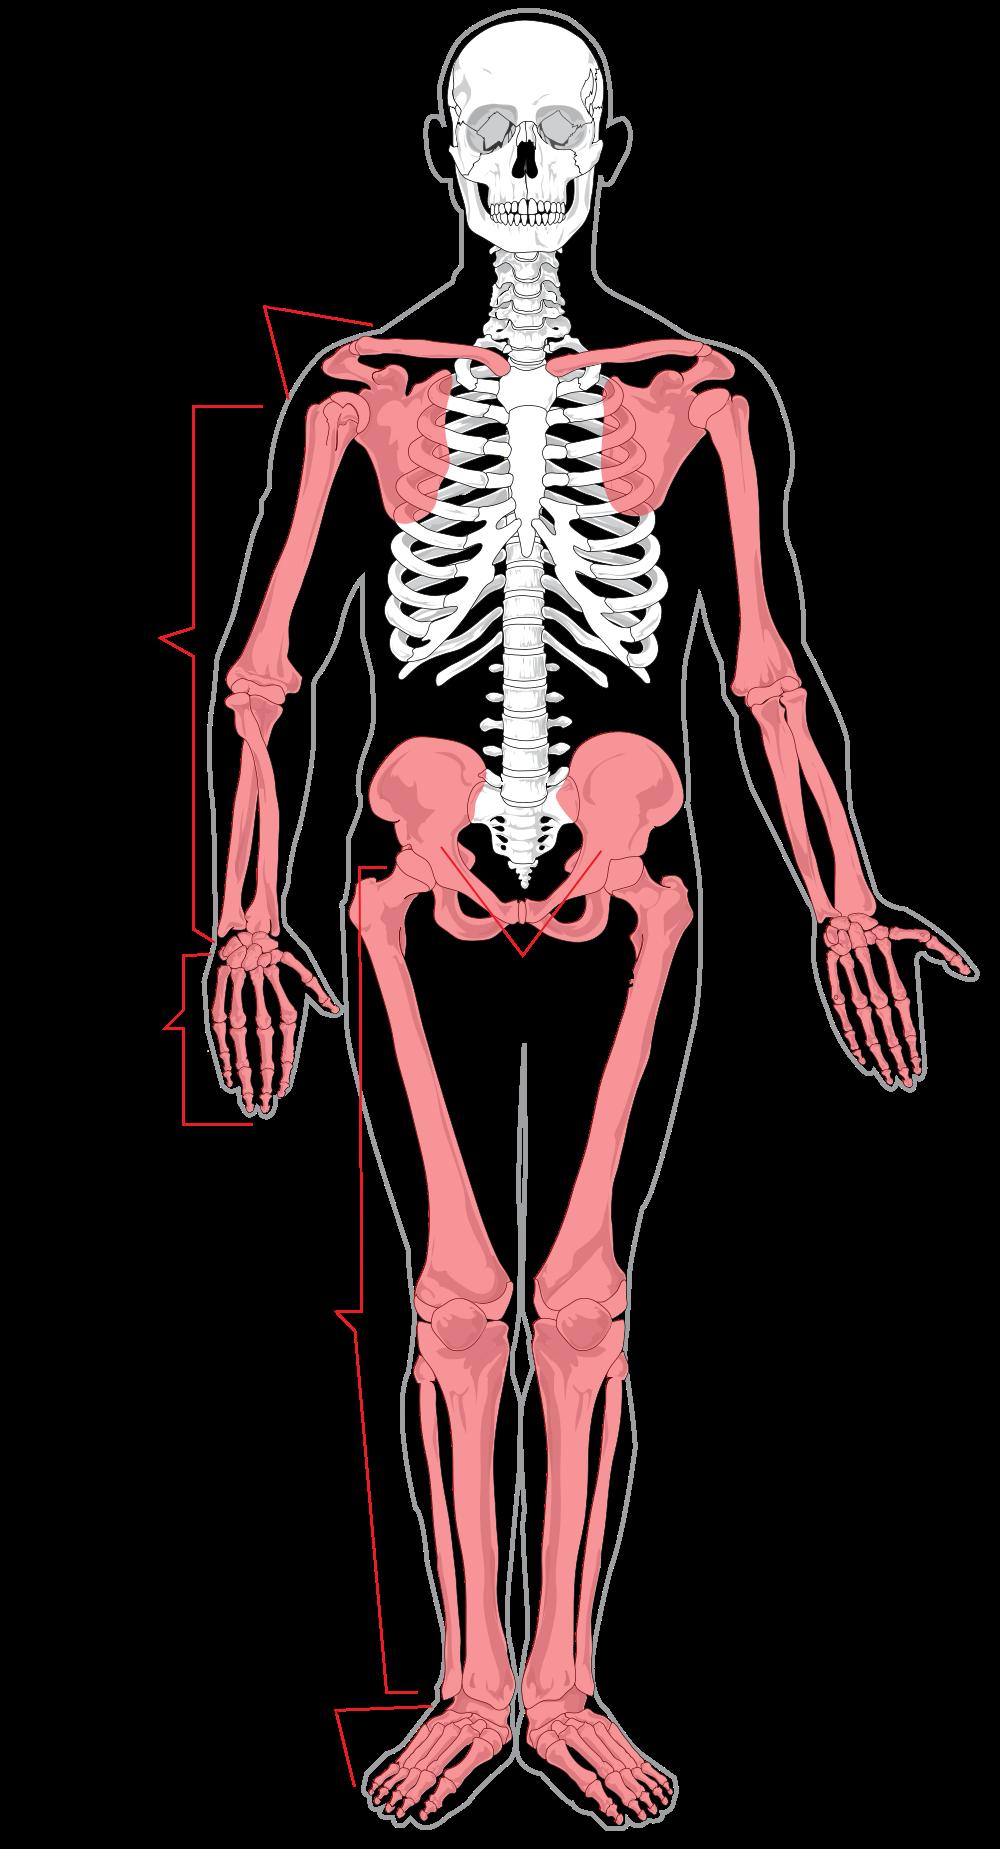 Excepcional labeled diagram elaboraci. Skeleton clipart body part